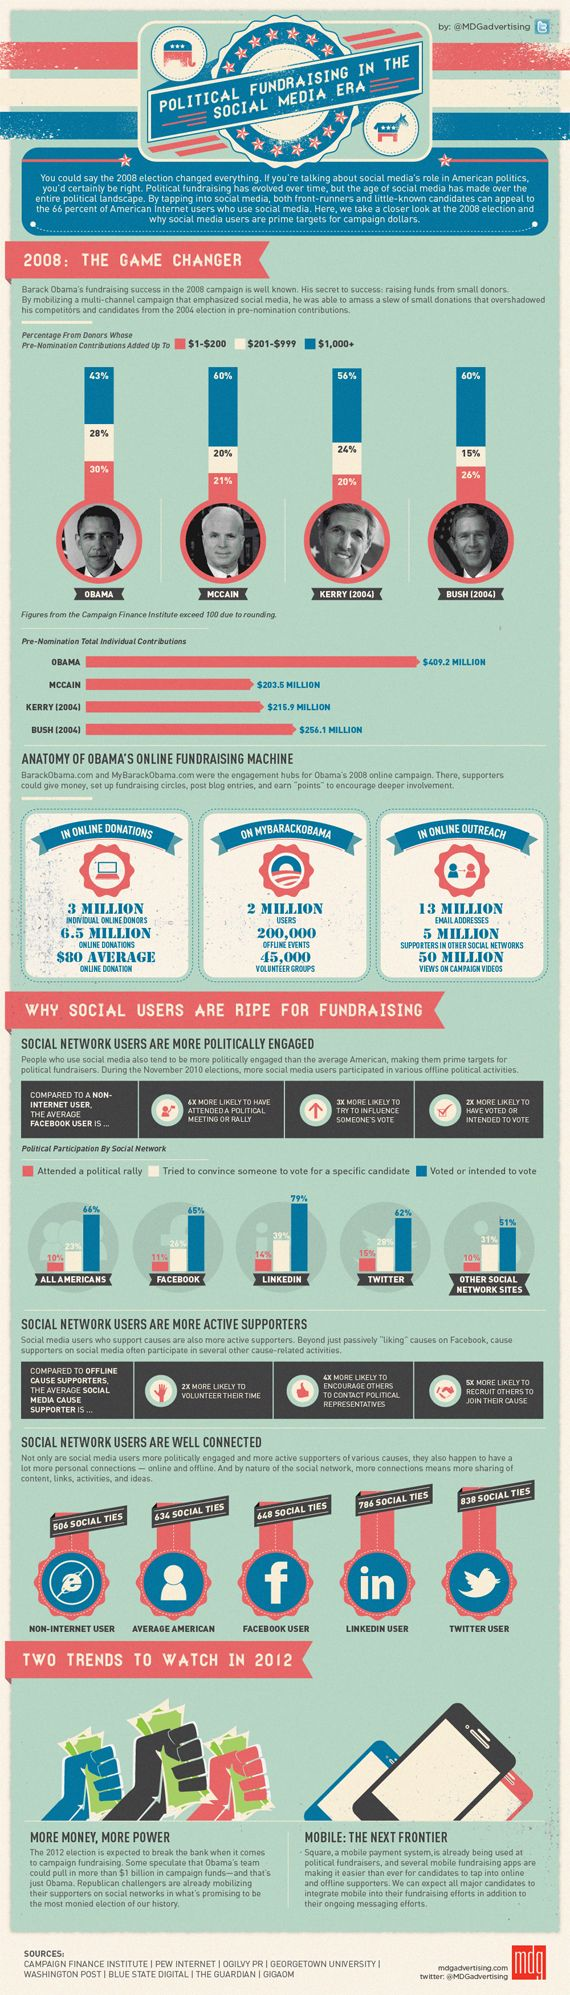 Political Fundraising in the Social Media Era  http://socialtimes.com/political-fundraising-infographic_b91001?utm_source=twitterfeed_medium=twitter_campaign=Feed%3A+socialtimes+%28SocialTimes.com%29